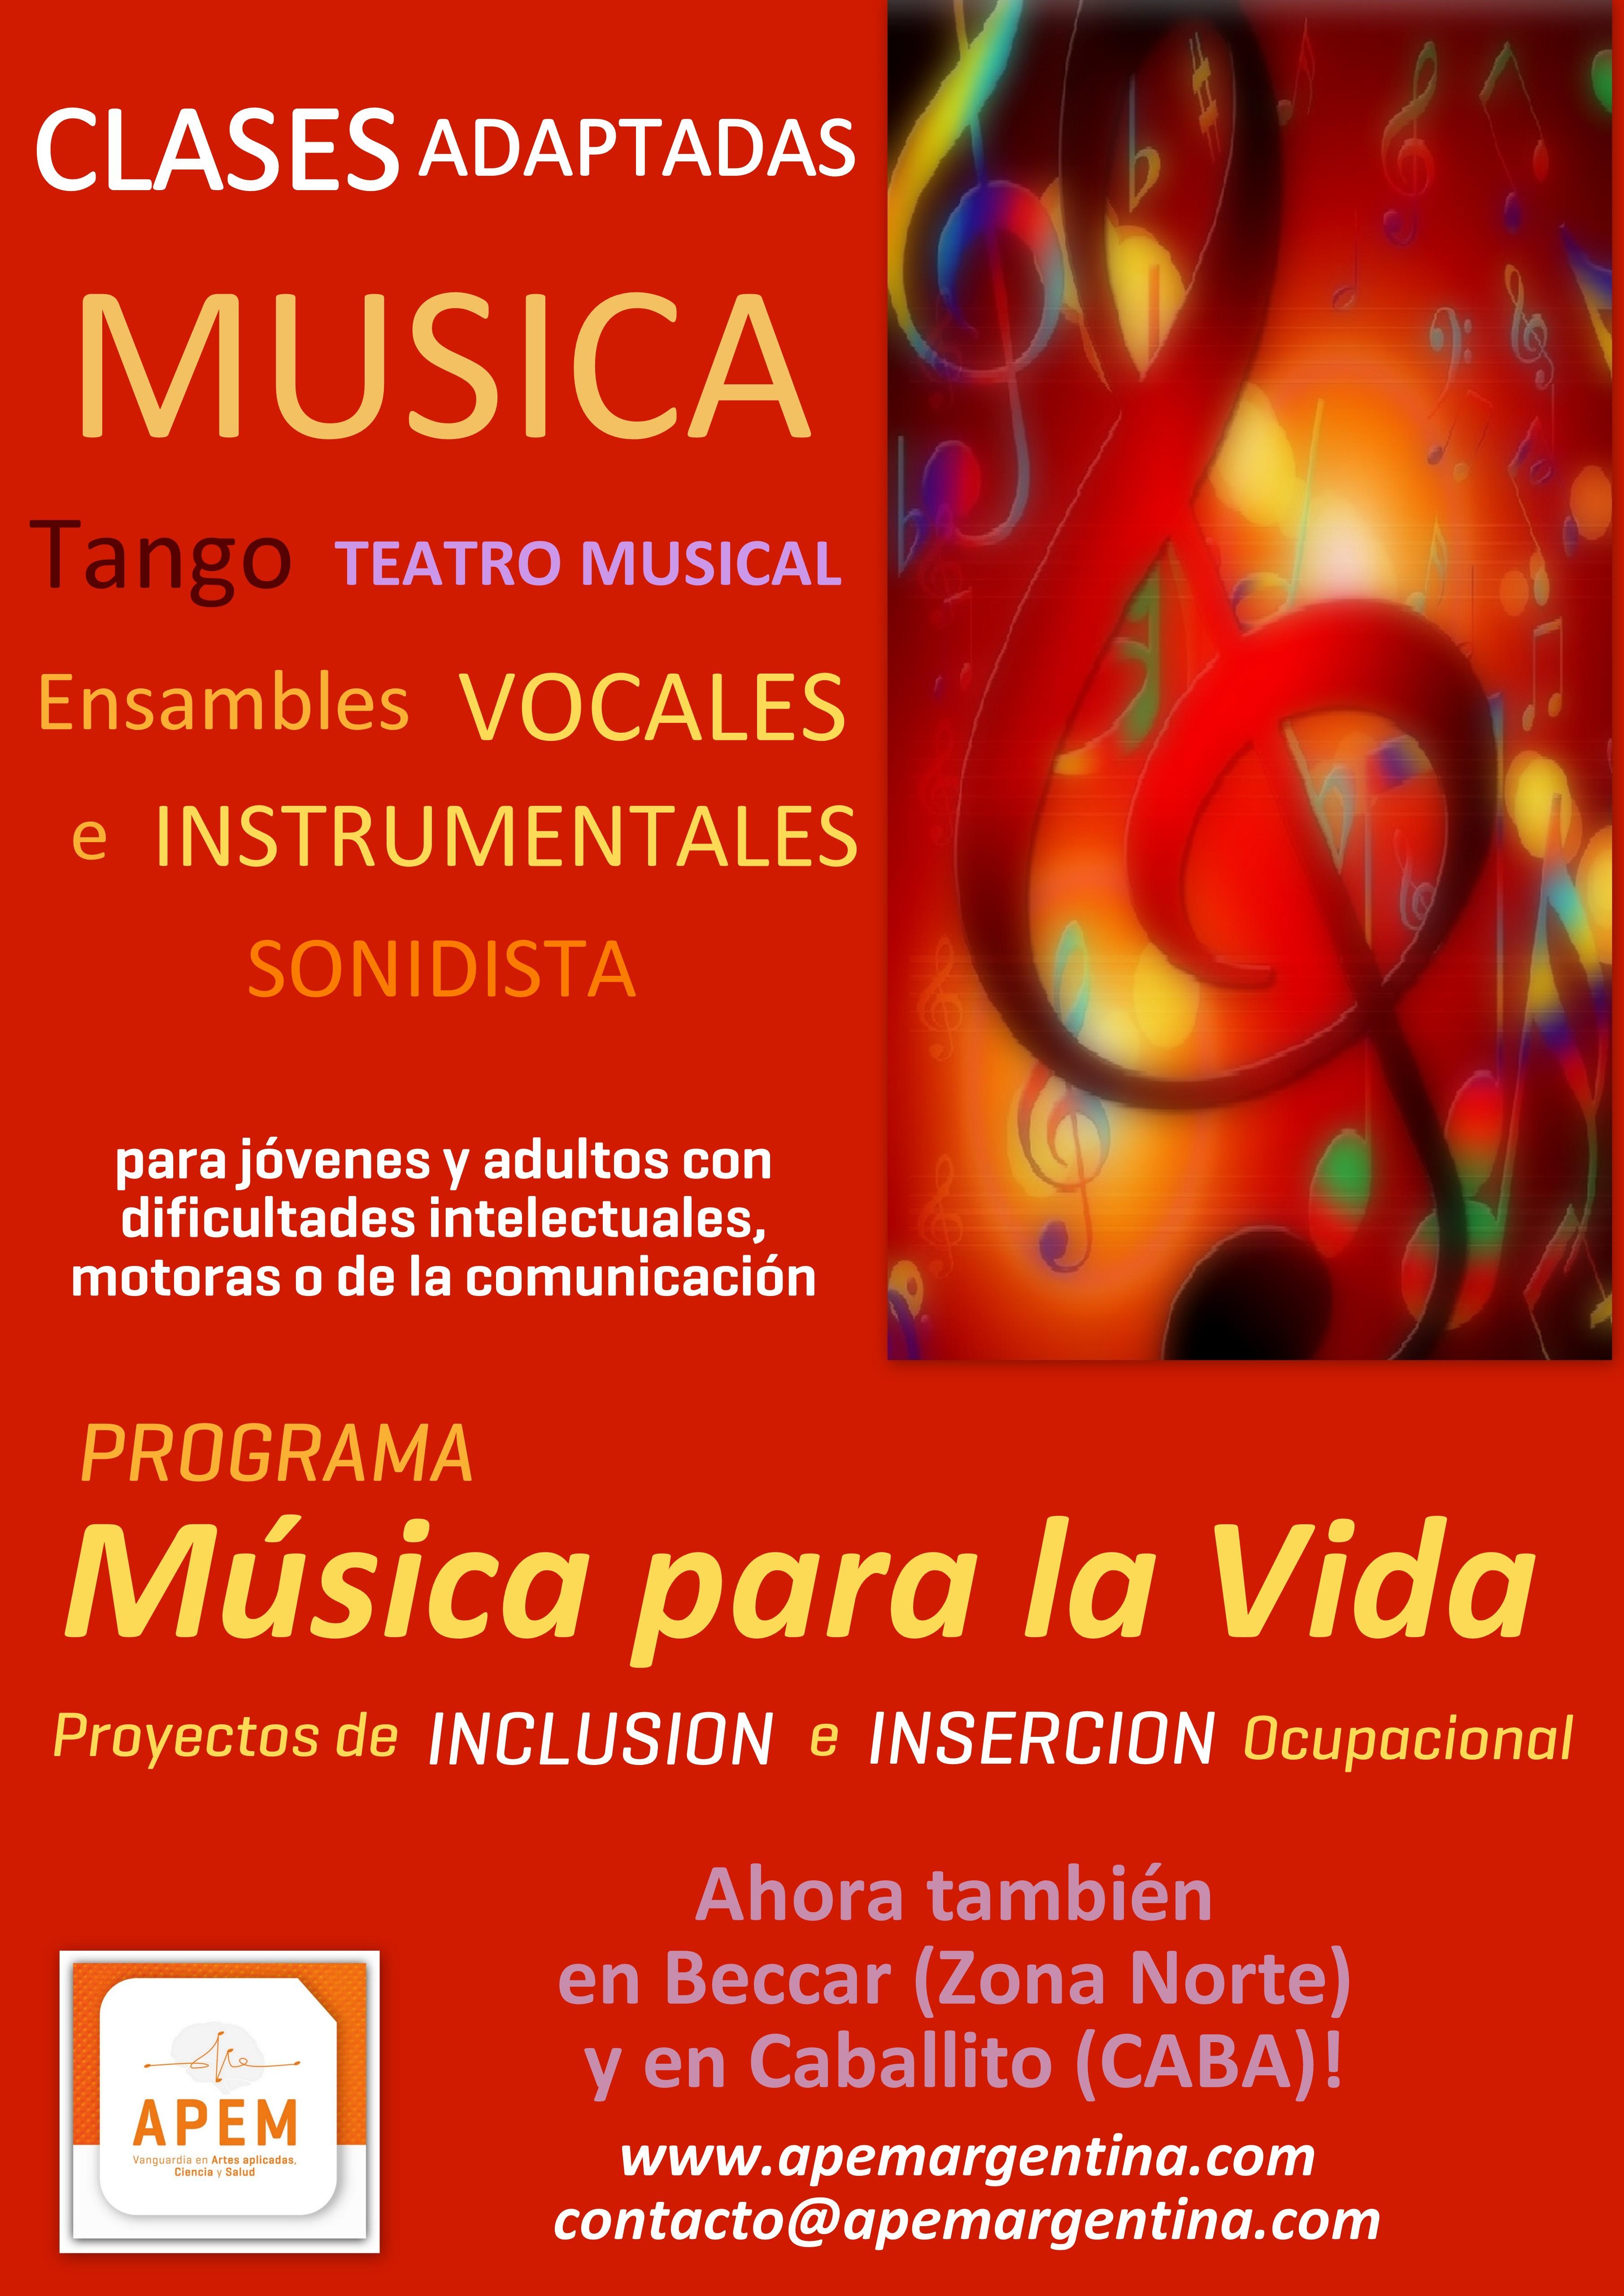 Programa Musica para la Vida Beccar Caba